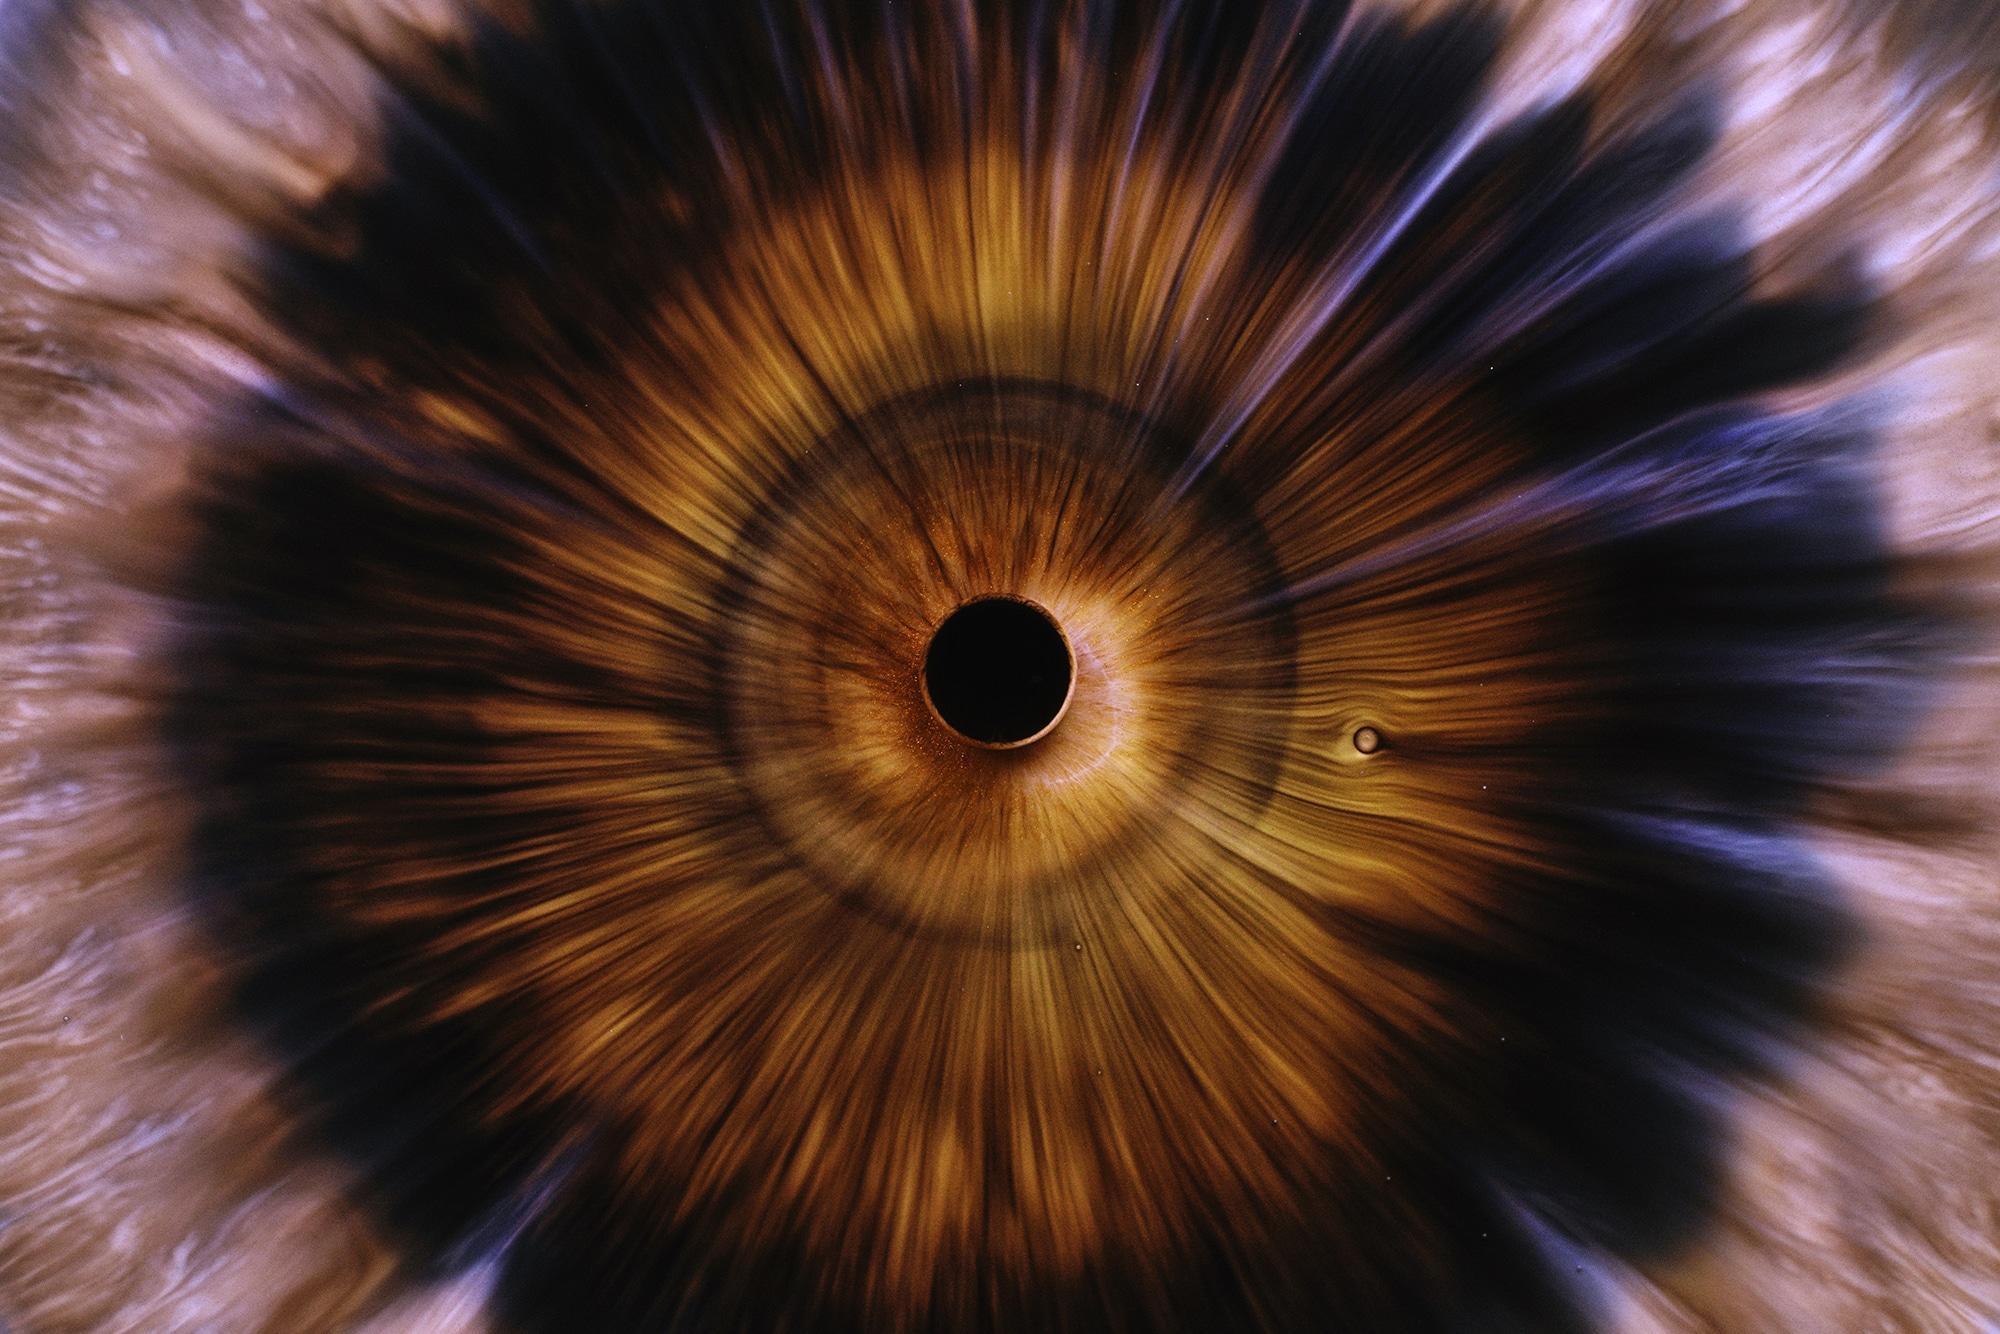 Abstract Liquid Experiments by Rus Khasanov